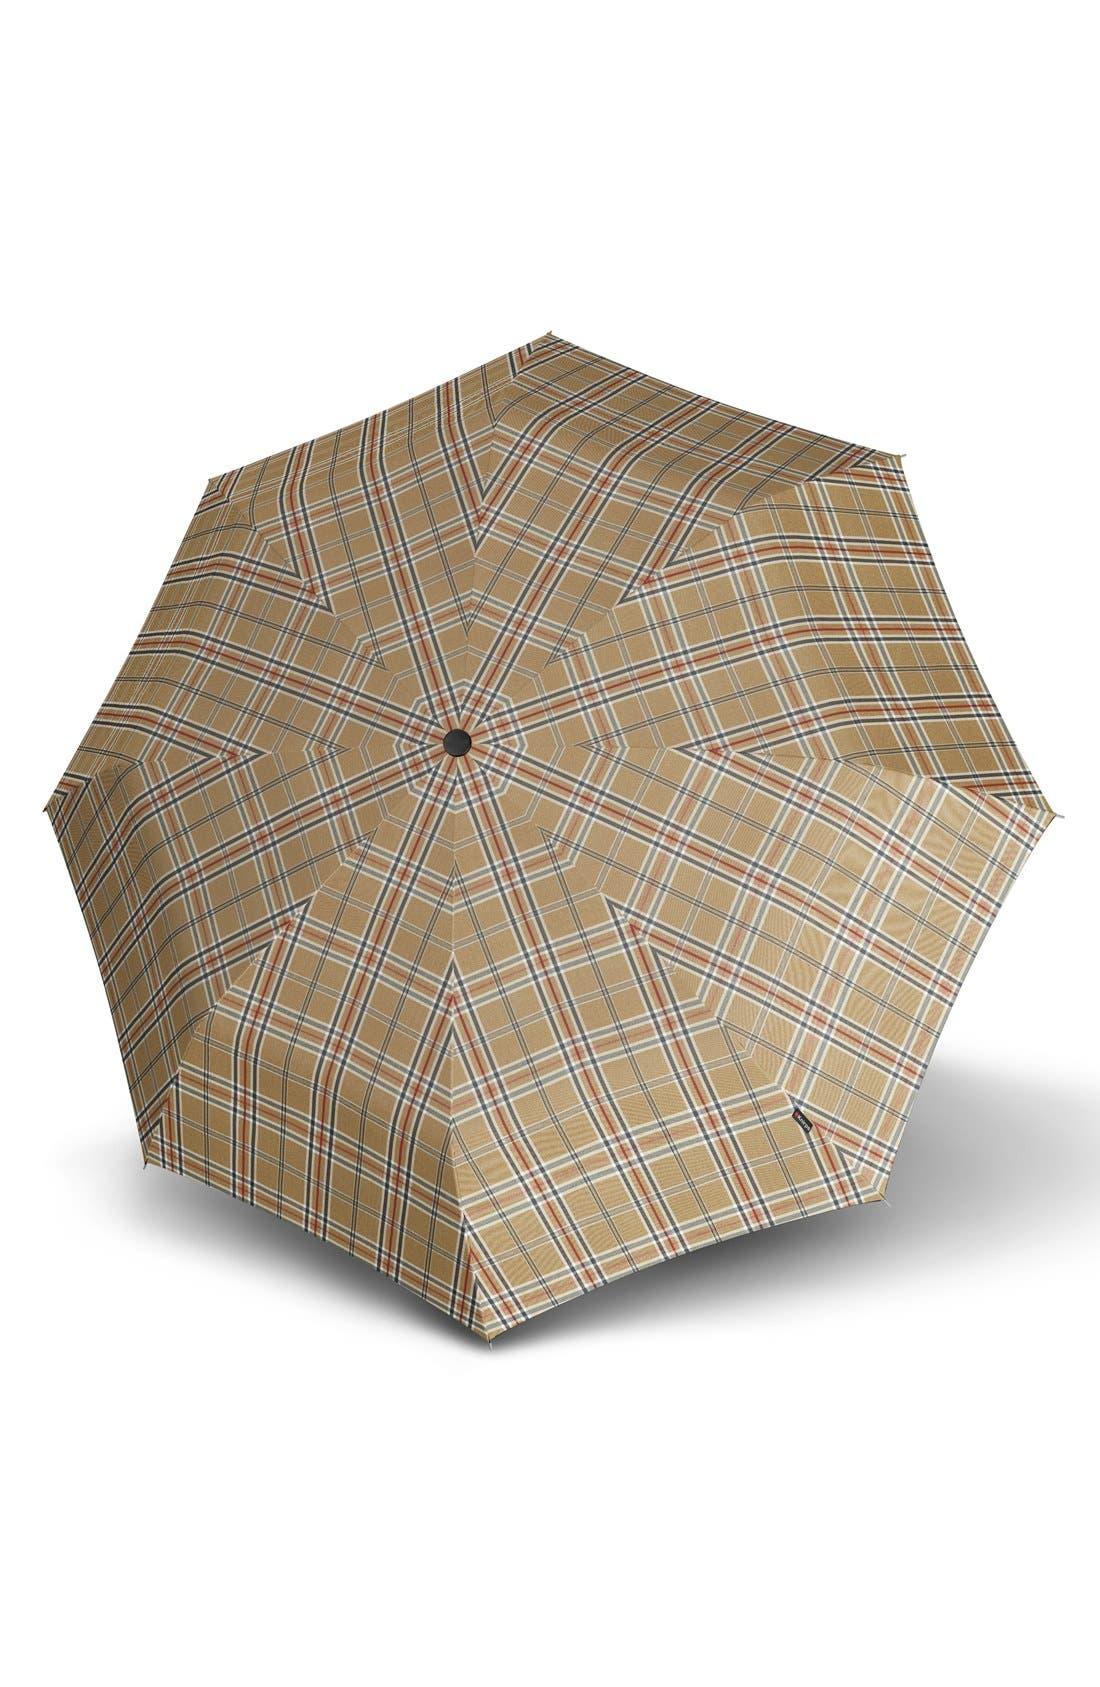 Knirps 'T2 Duomatic' Umbrella